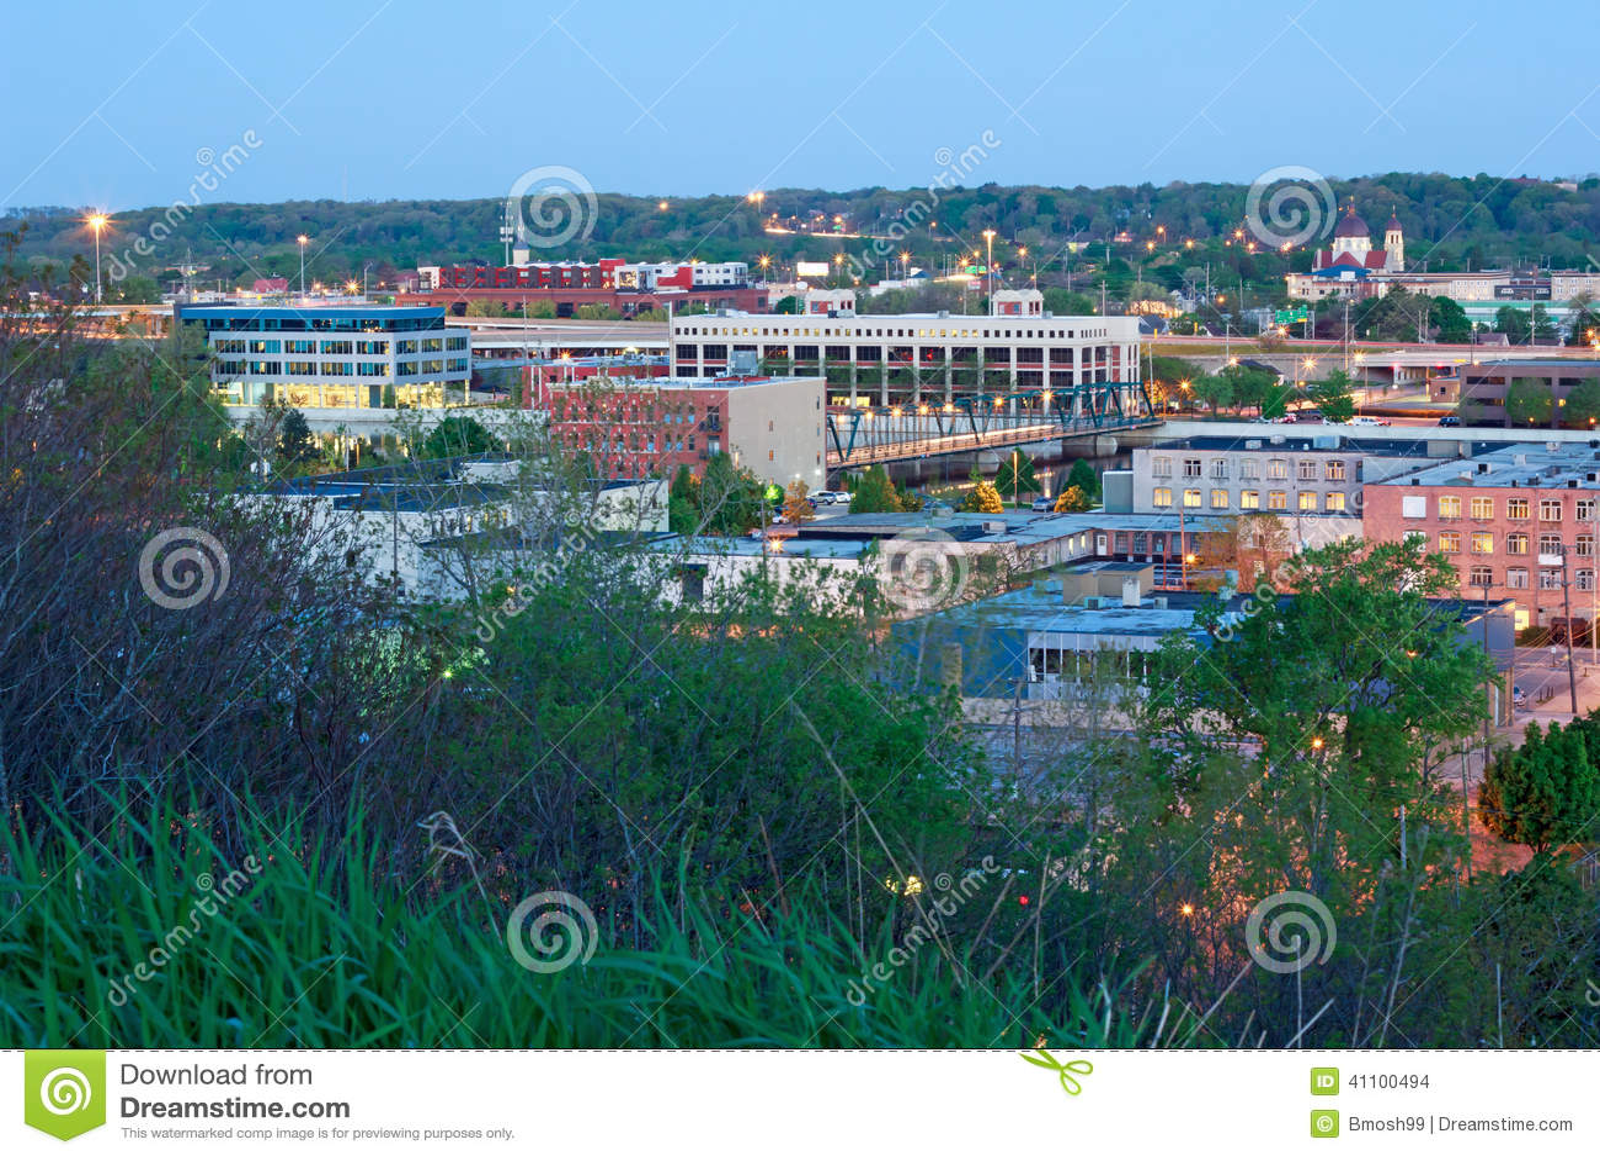 Early morning Grand Rapids Michigan. Royalty-Free Stock Photo